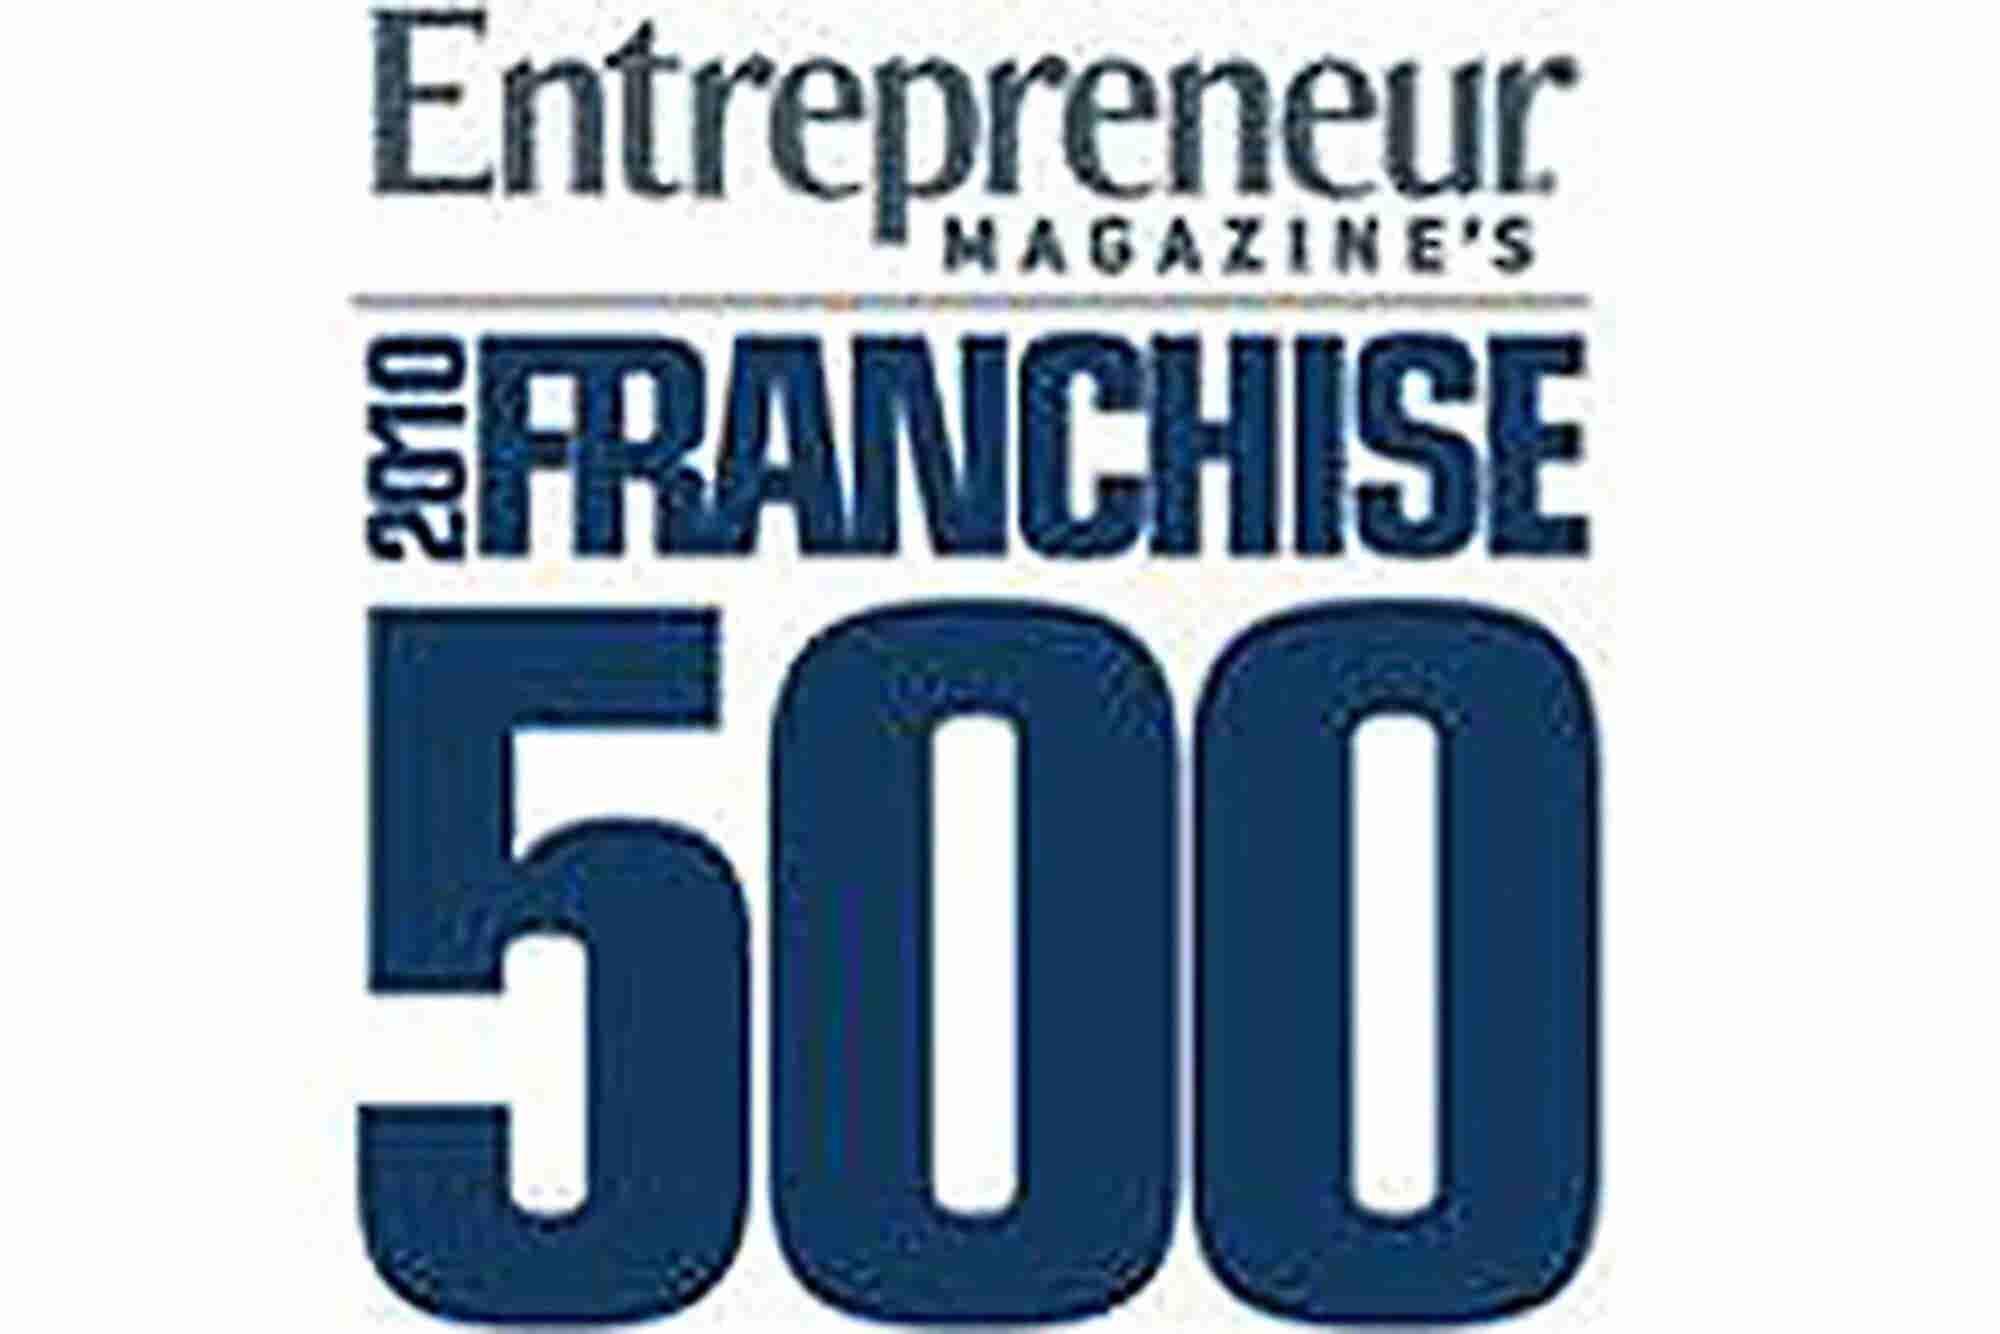 2010 Franchise 500 Top 10